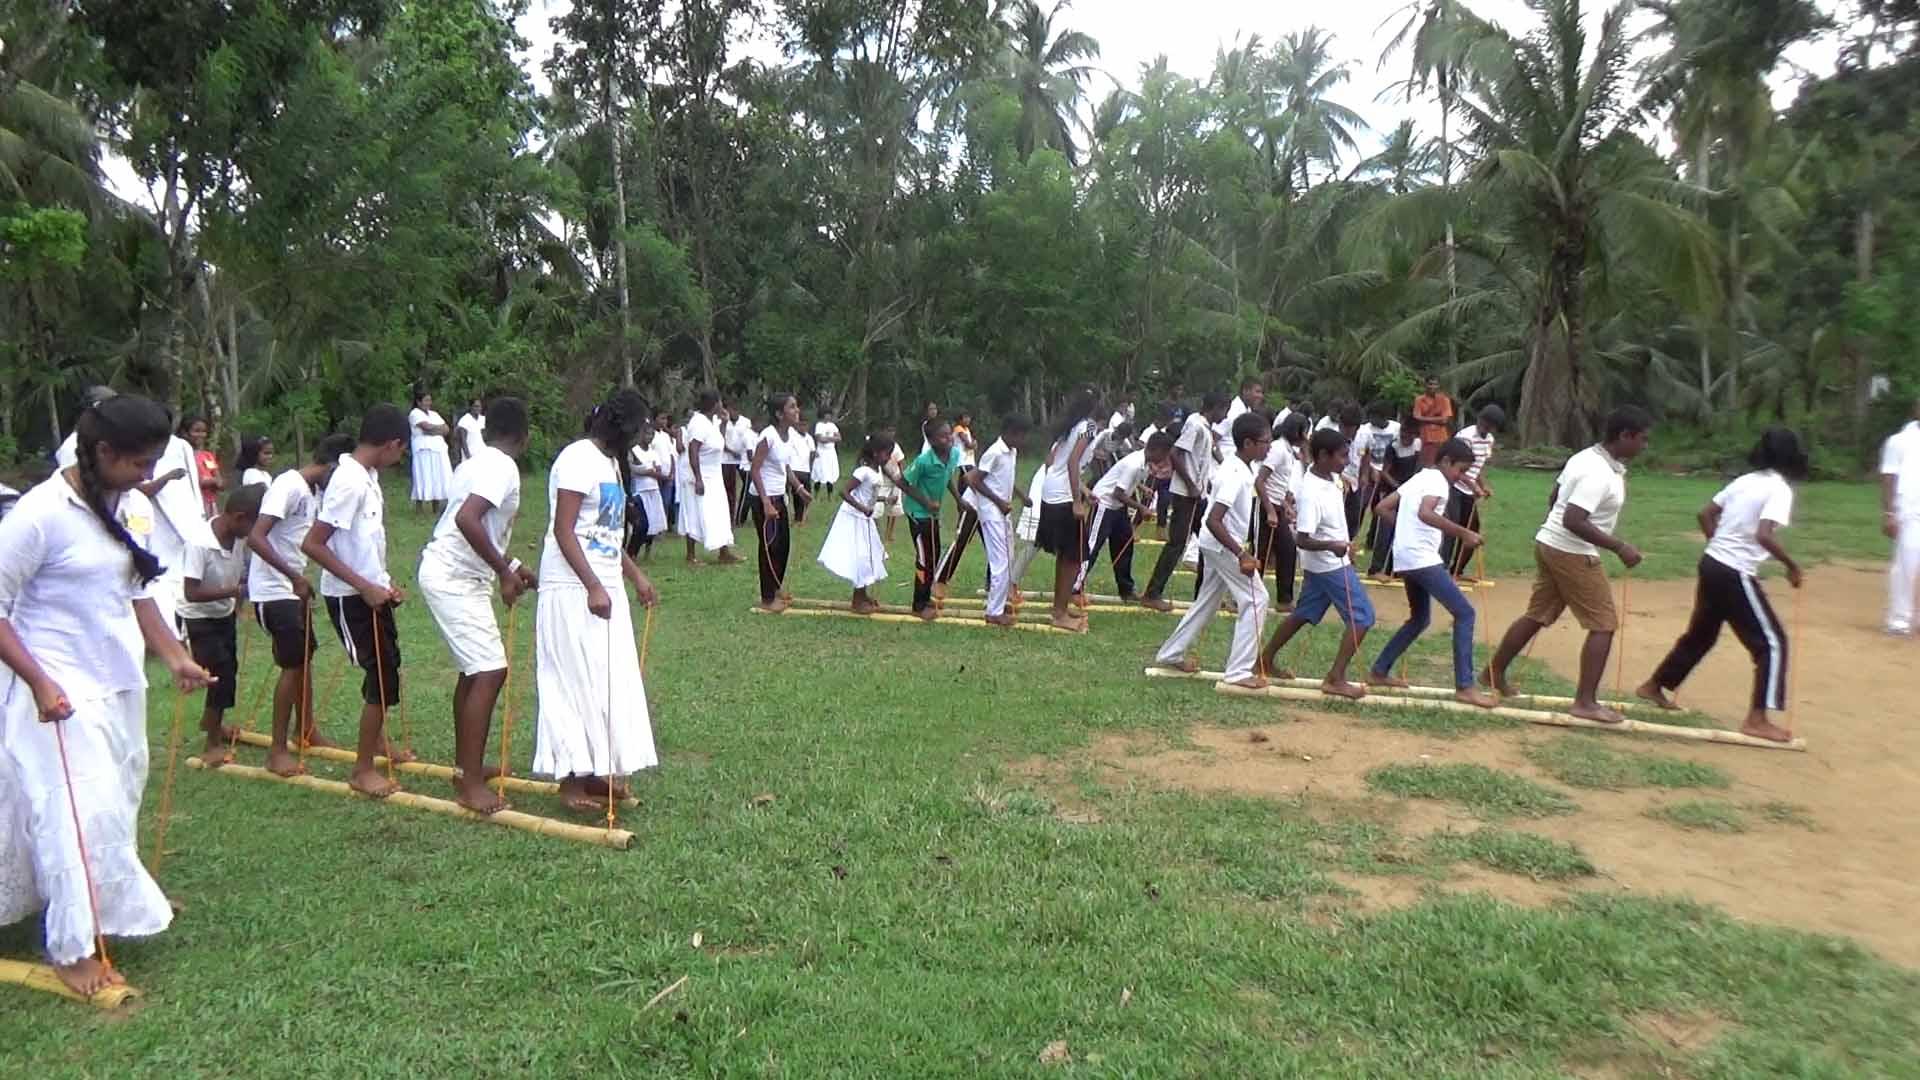 Sati Pasala Mindfulness Camp at Meethirigala Kanishta Vidyalaya-mindful games (14)